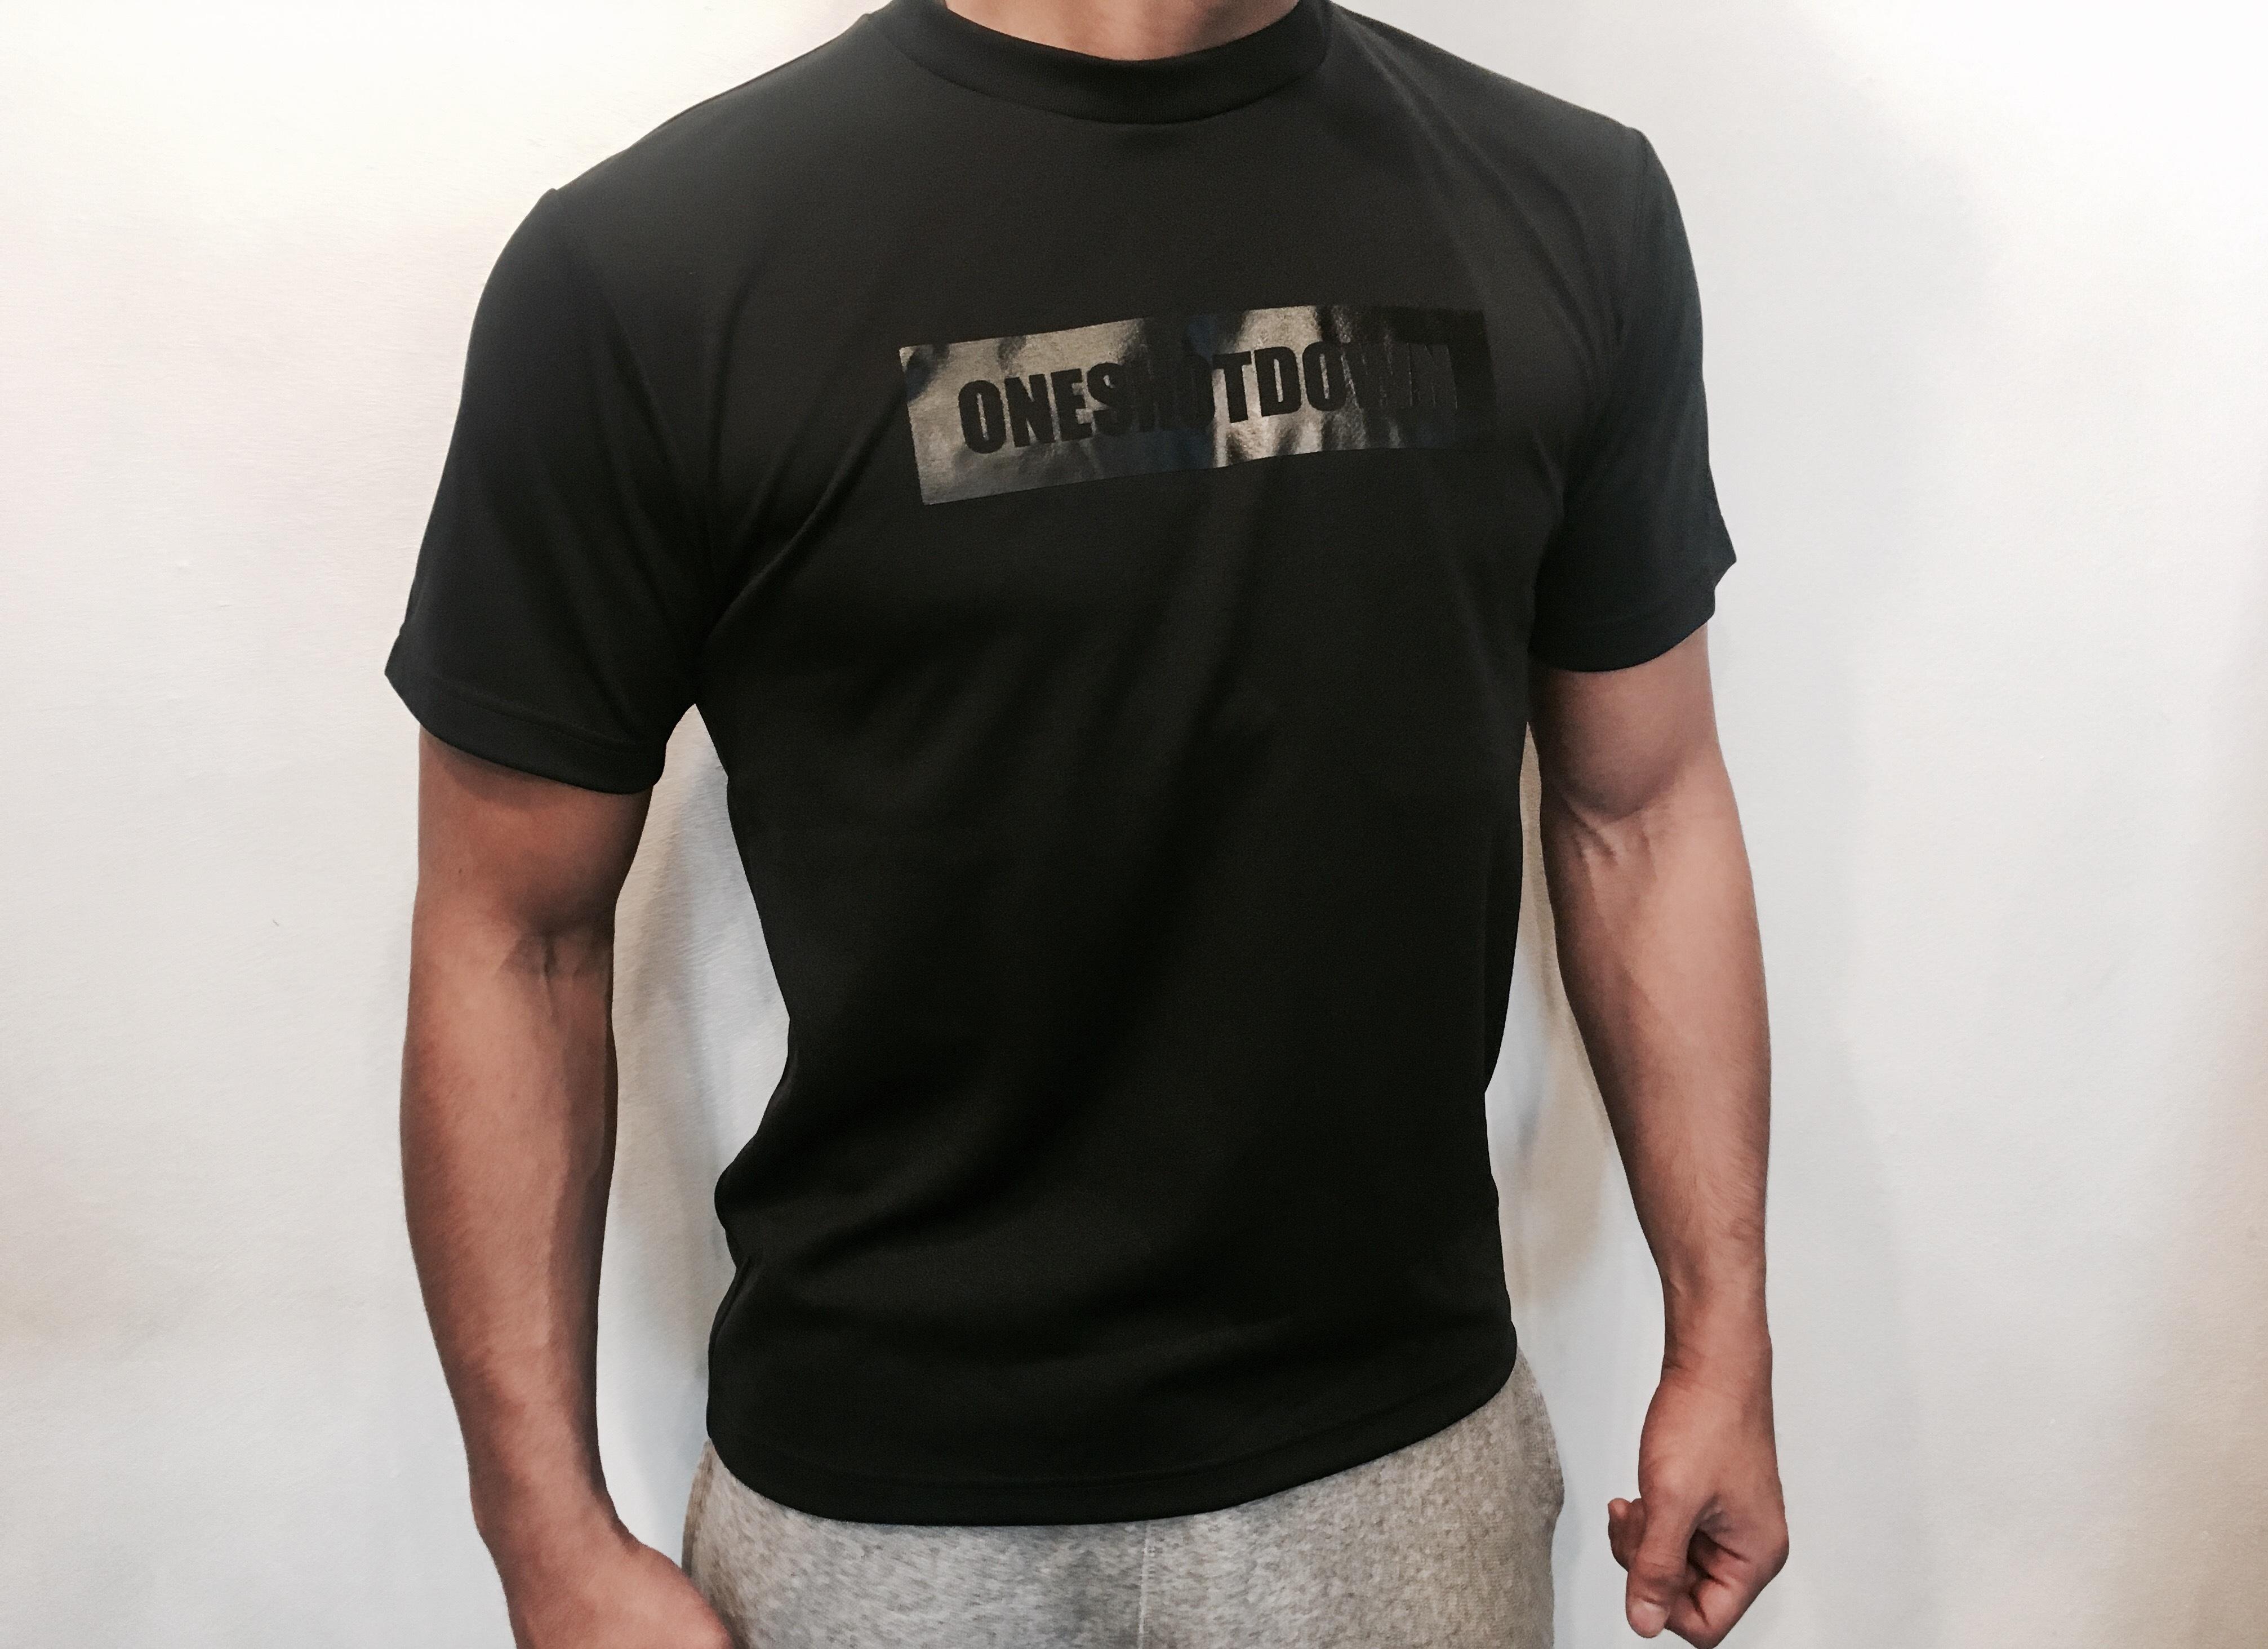 ONESHOTDOWN ボックスロゴ ドライTシャツ - 画像1